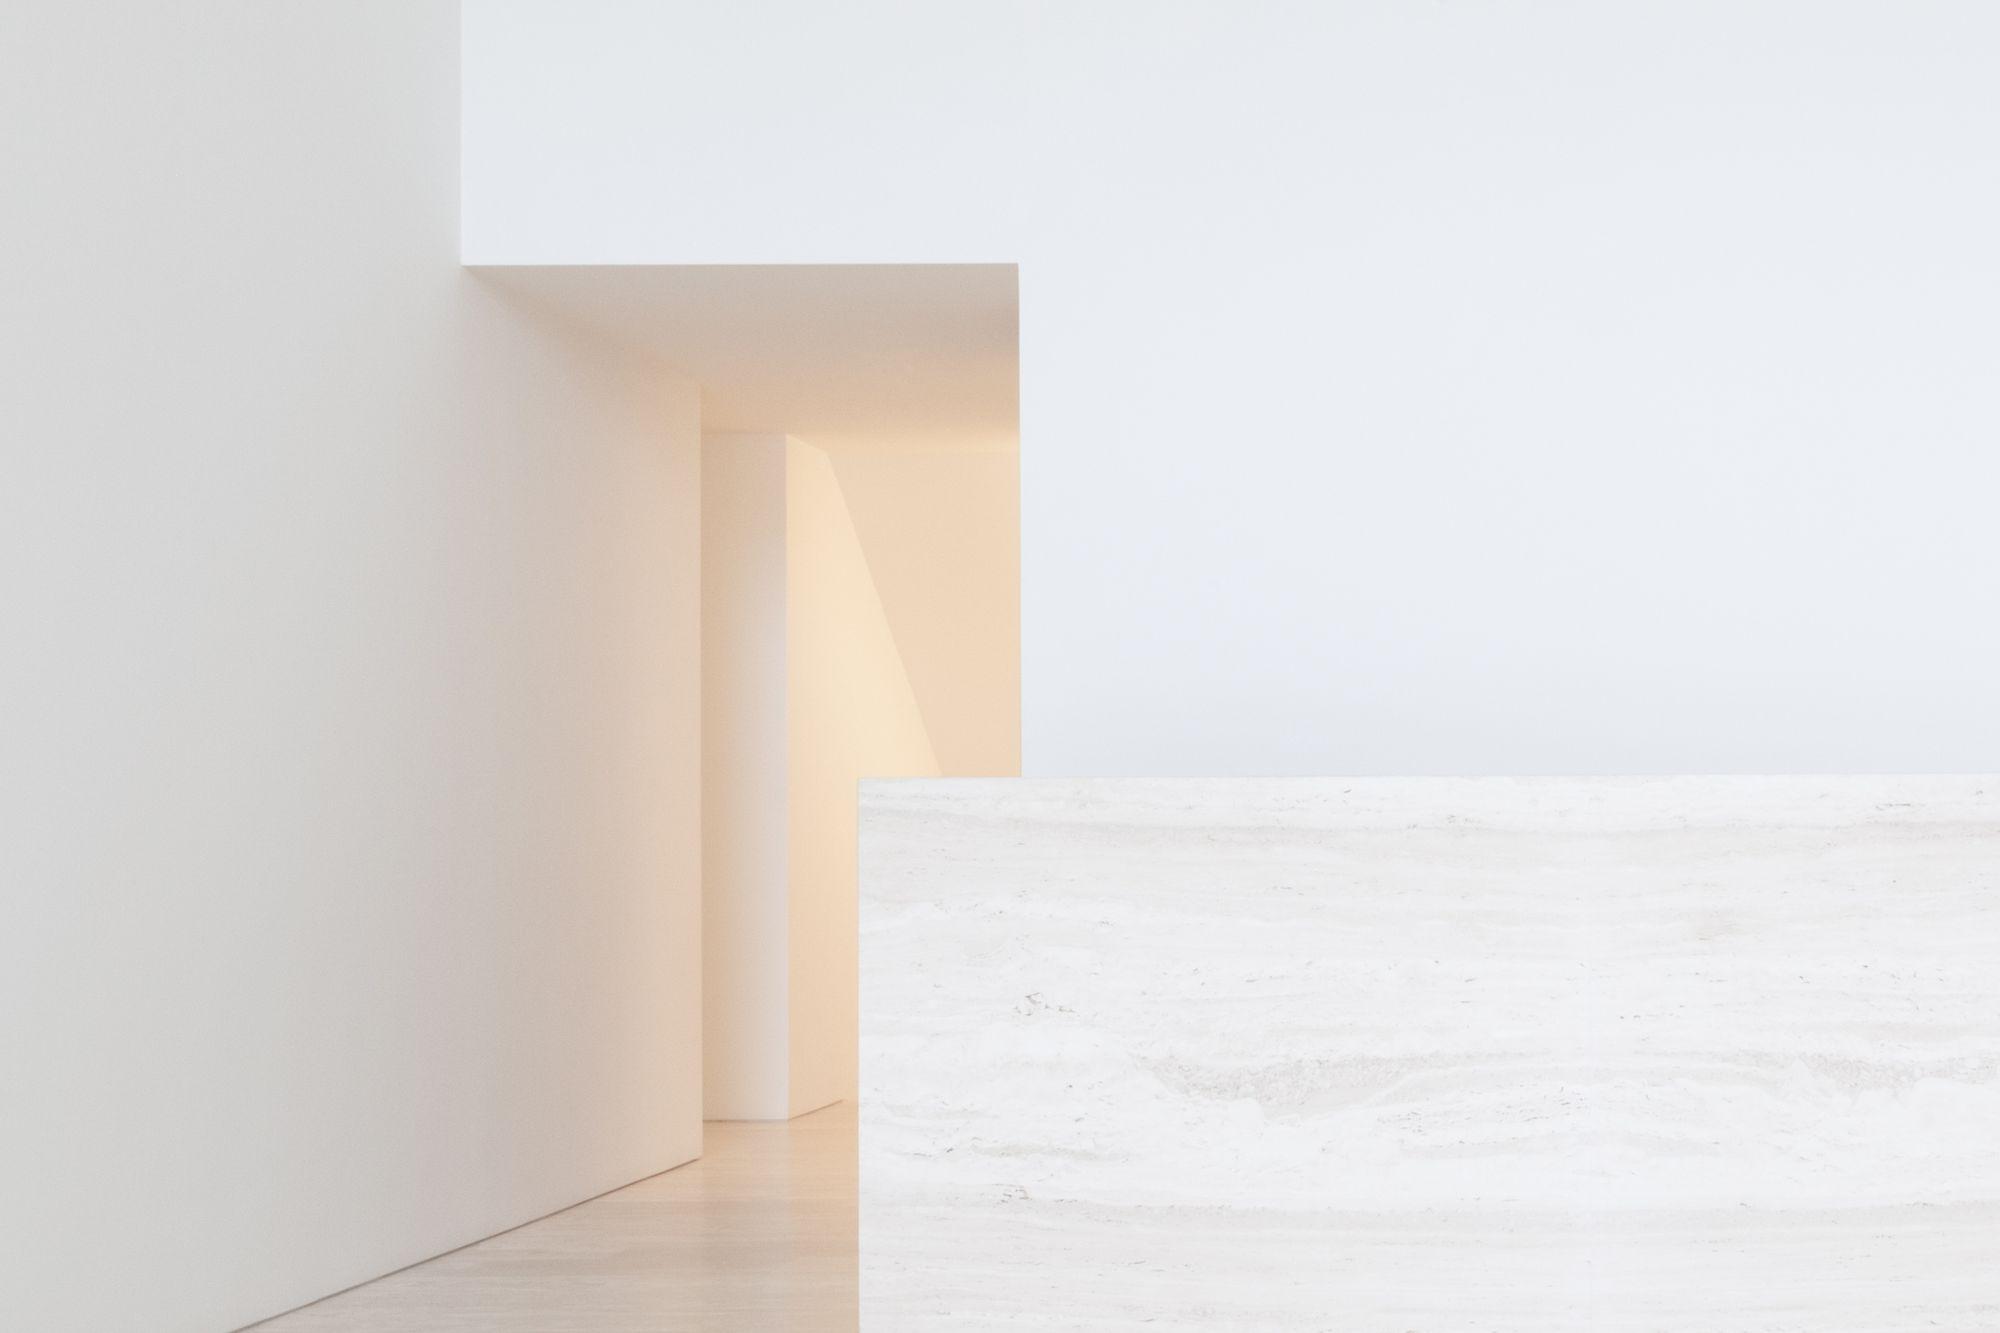 Image: Armonia Apartments by John Pawson